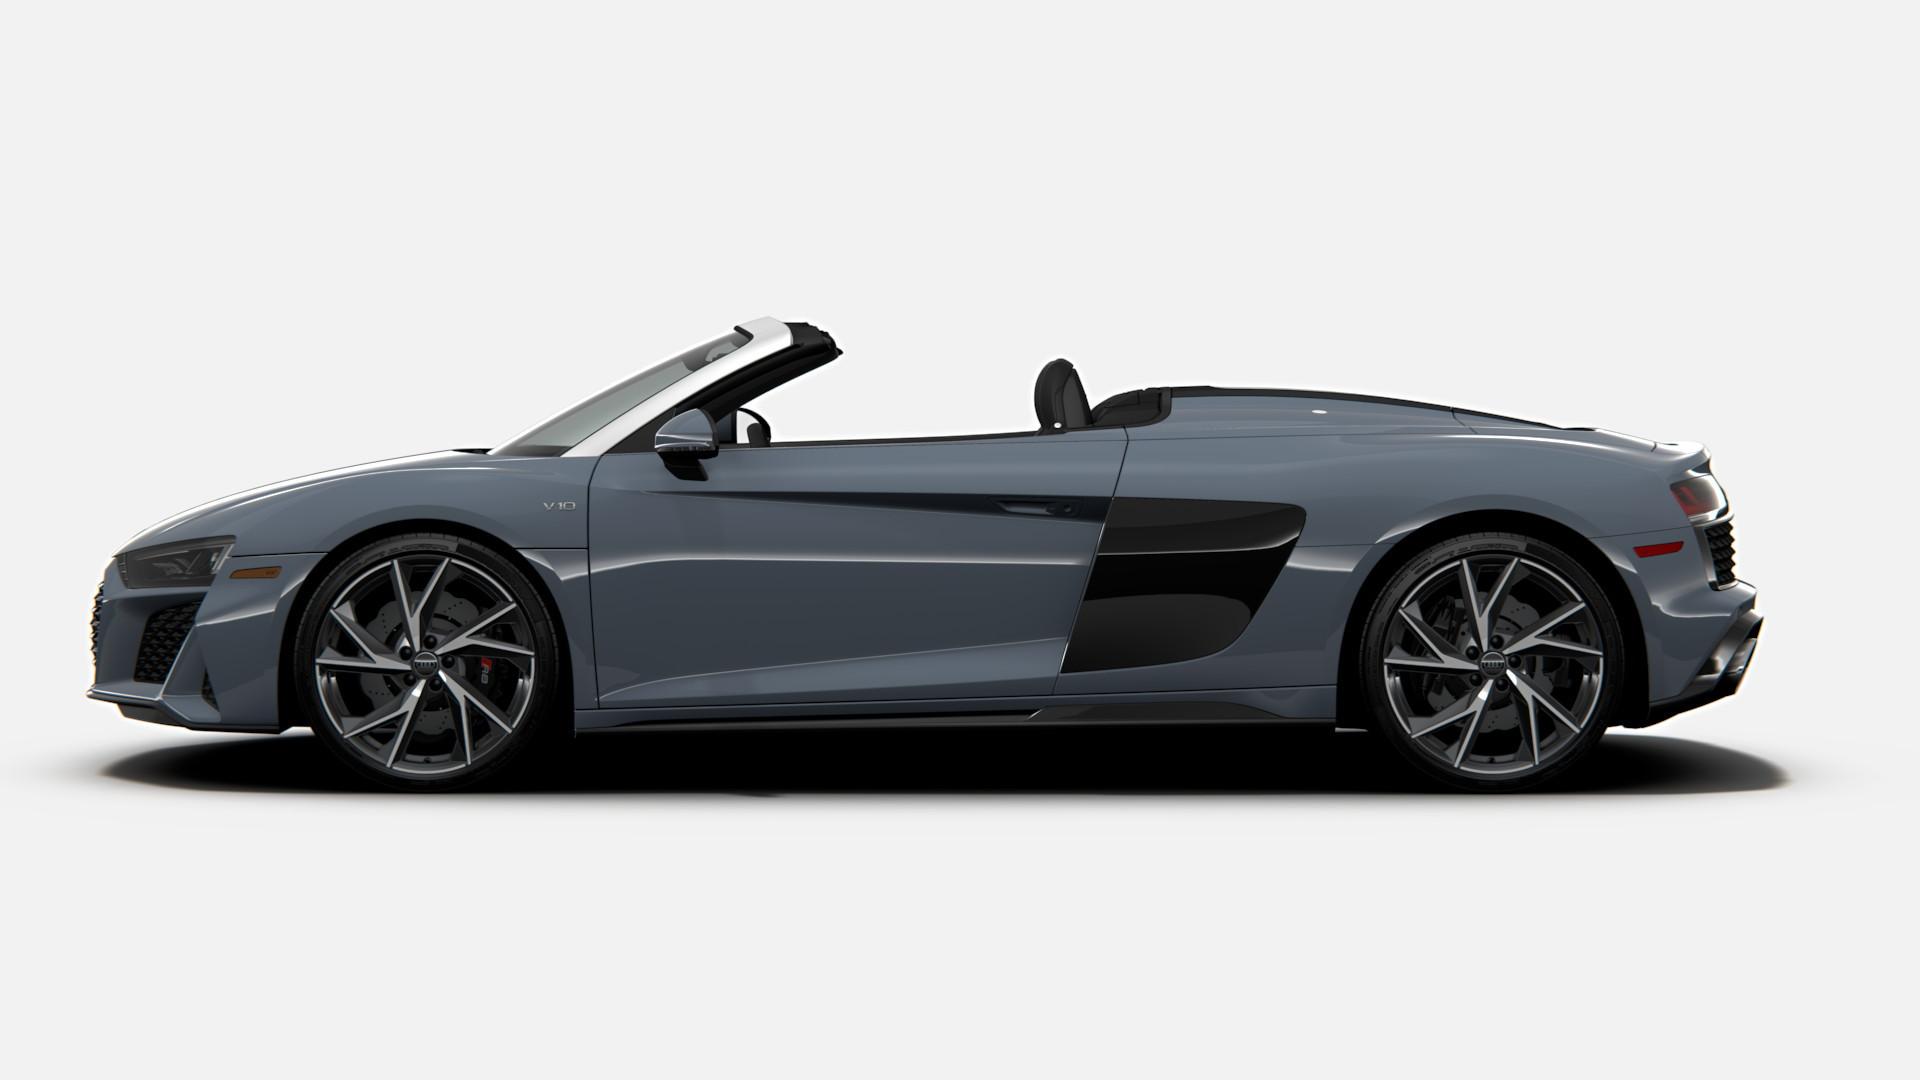 2021 audi r8 adding less-expensive rear-drive models